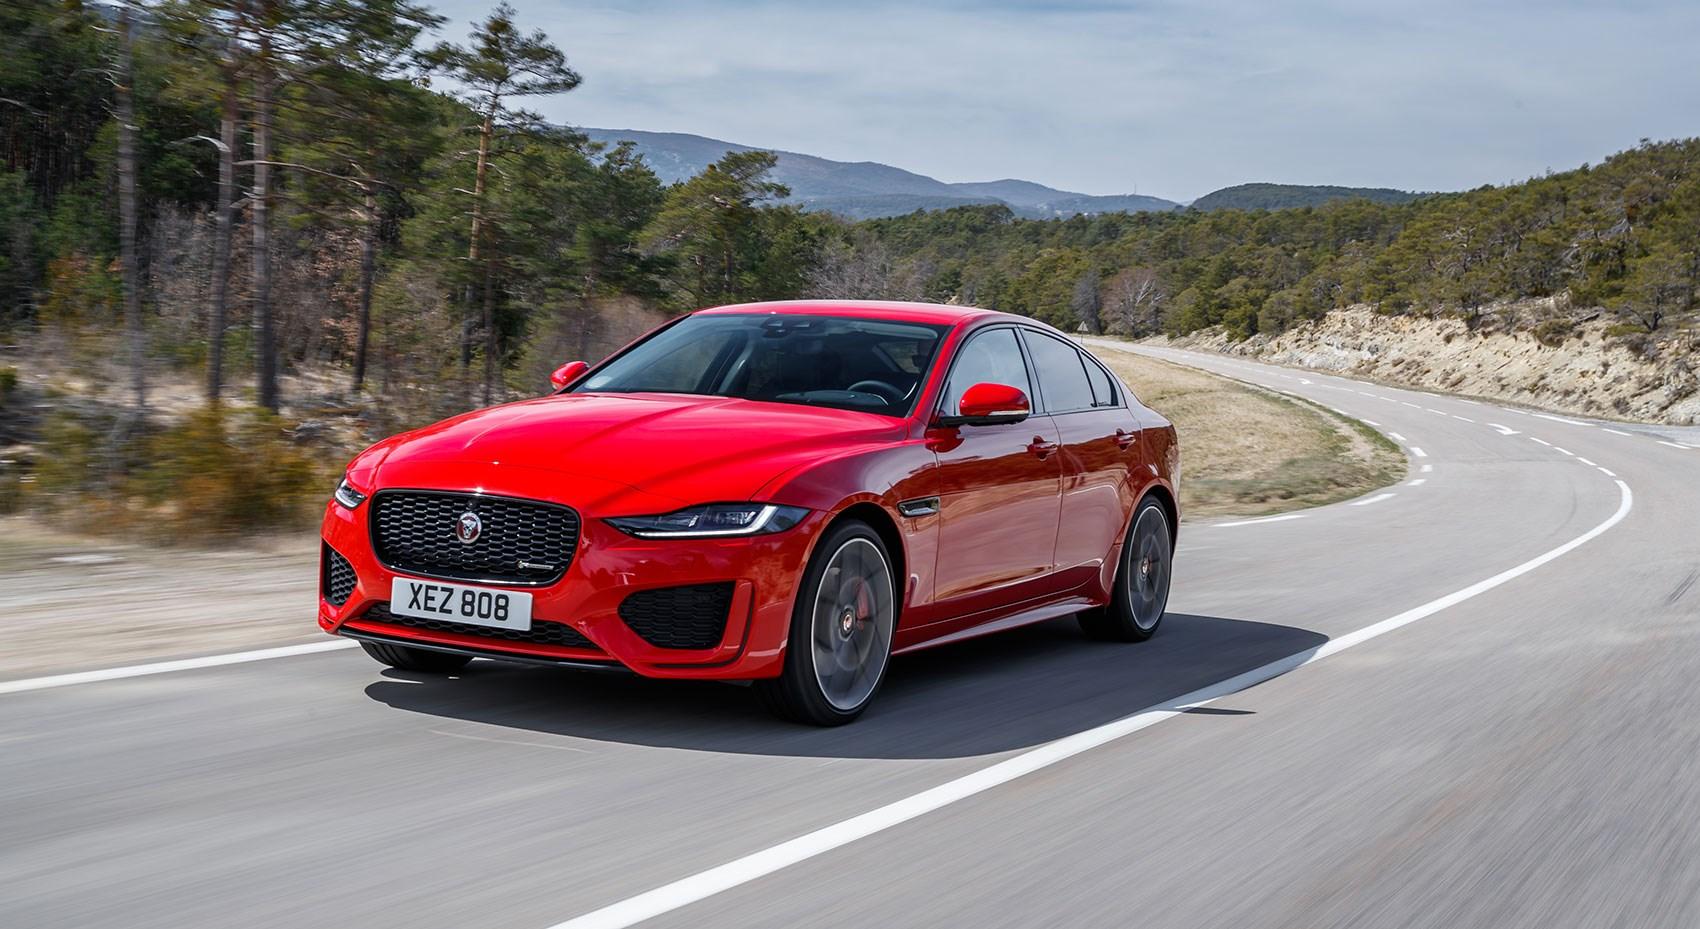 Jaguar XE review: 2020 model year test | CAR Magazine